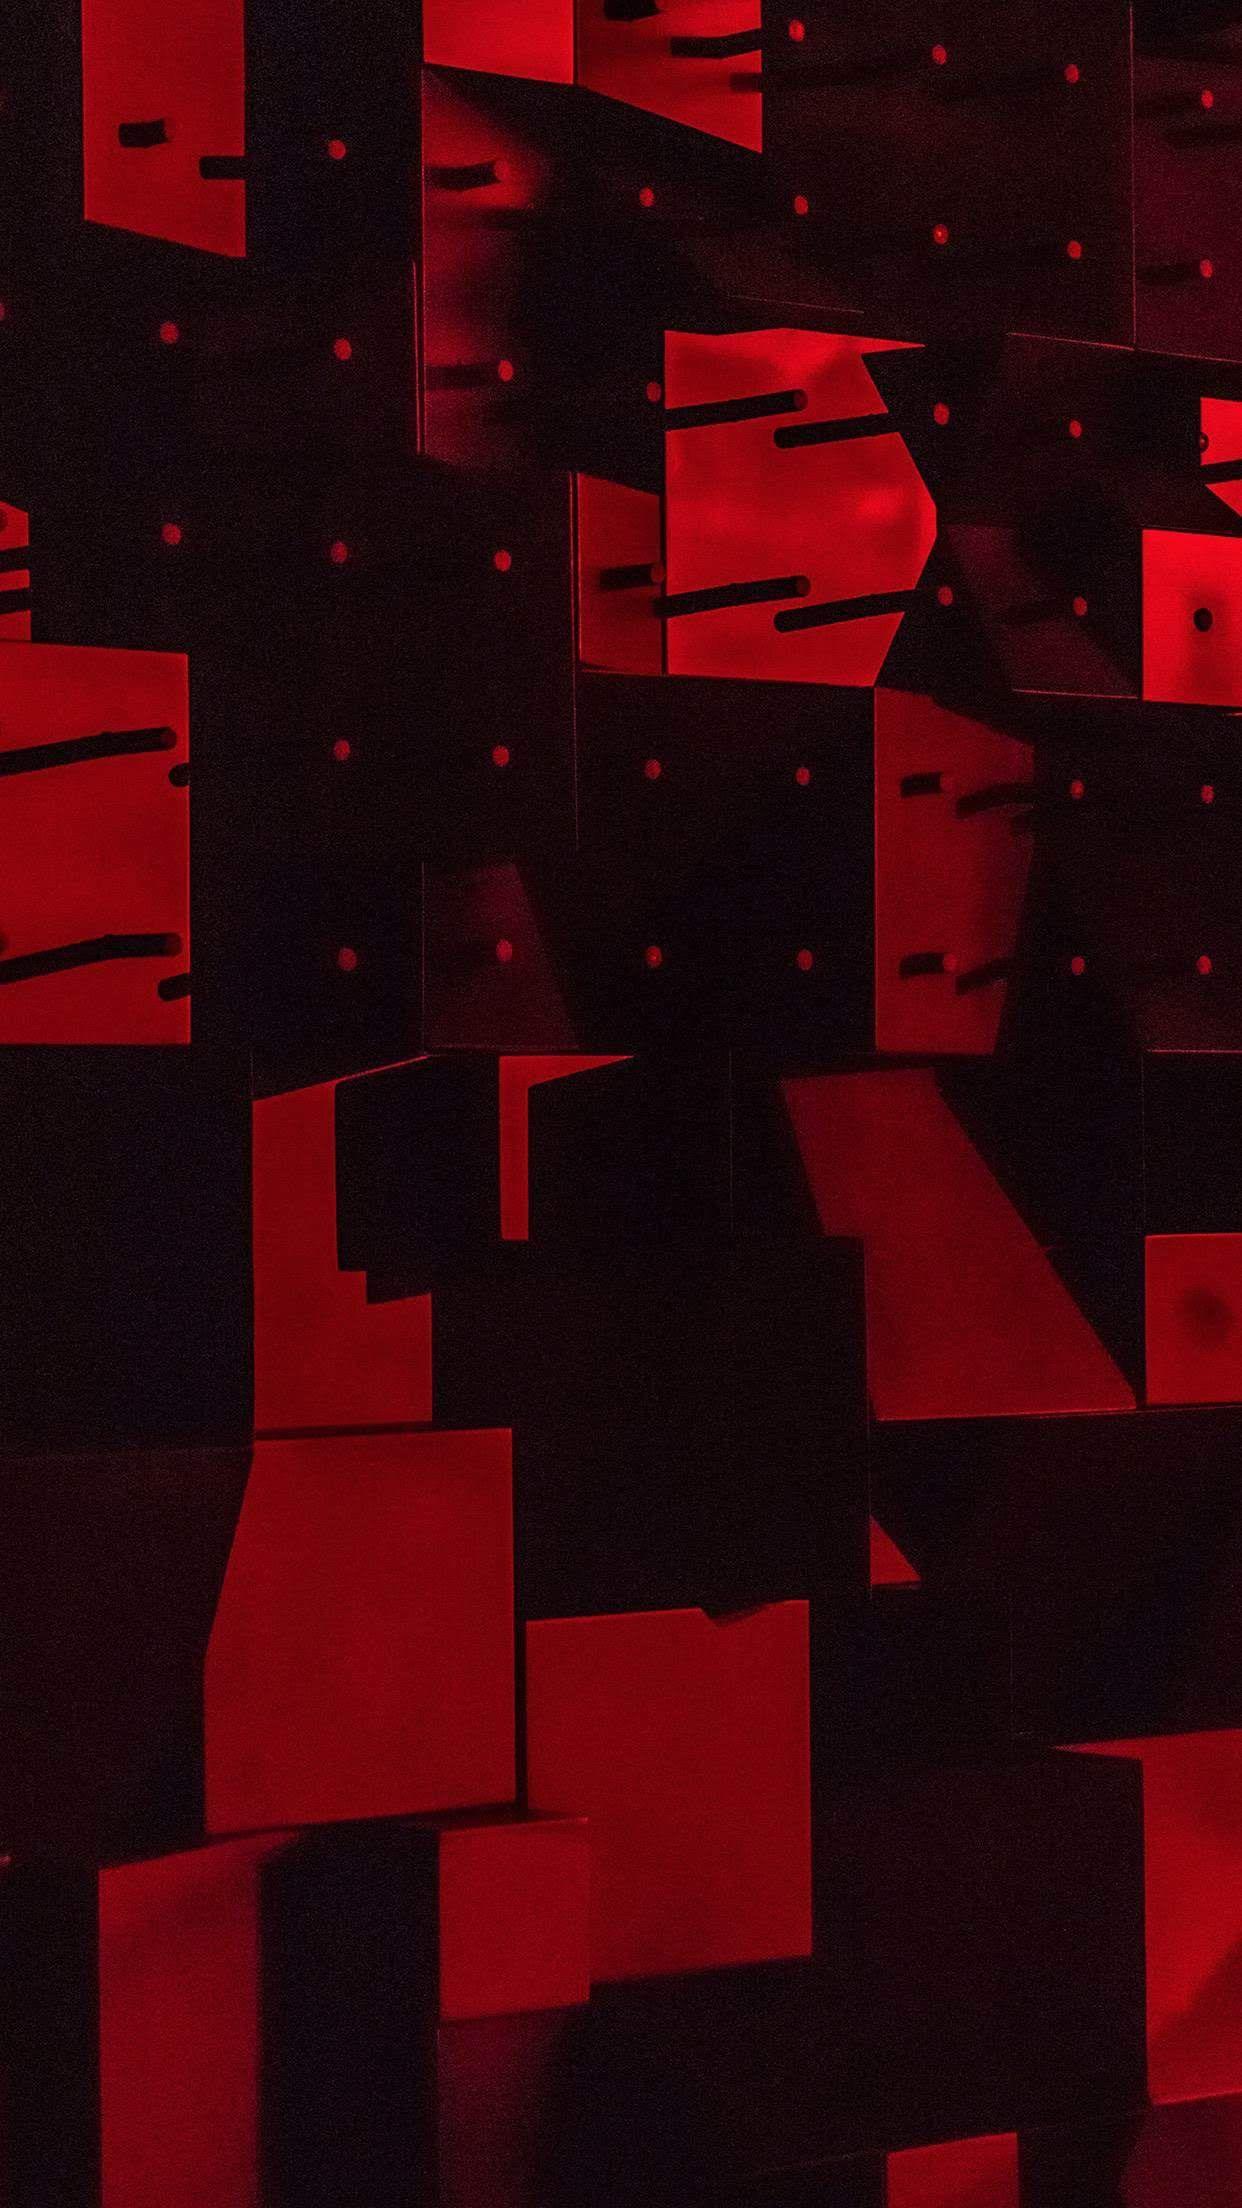 4k Wallpaper Red : wallpaper, Amoled, Wallpapers, Wallpaper